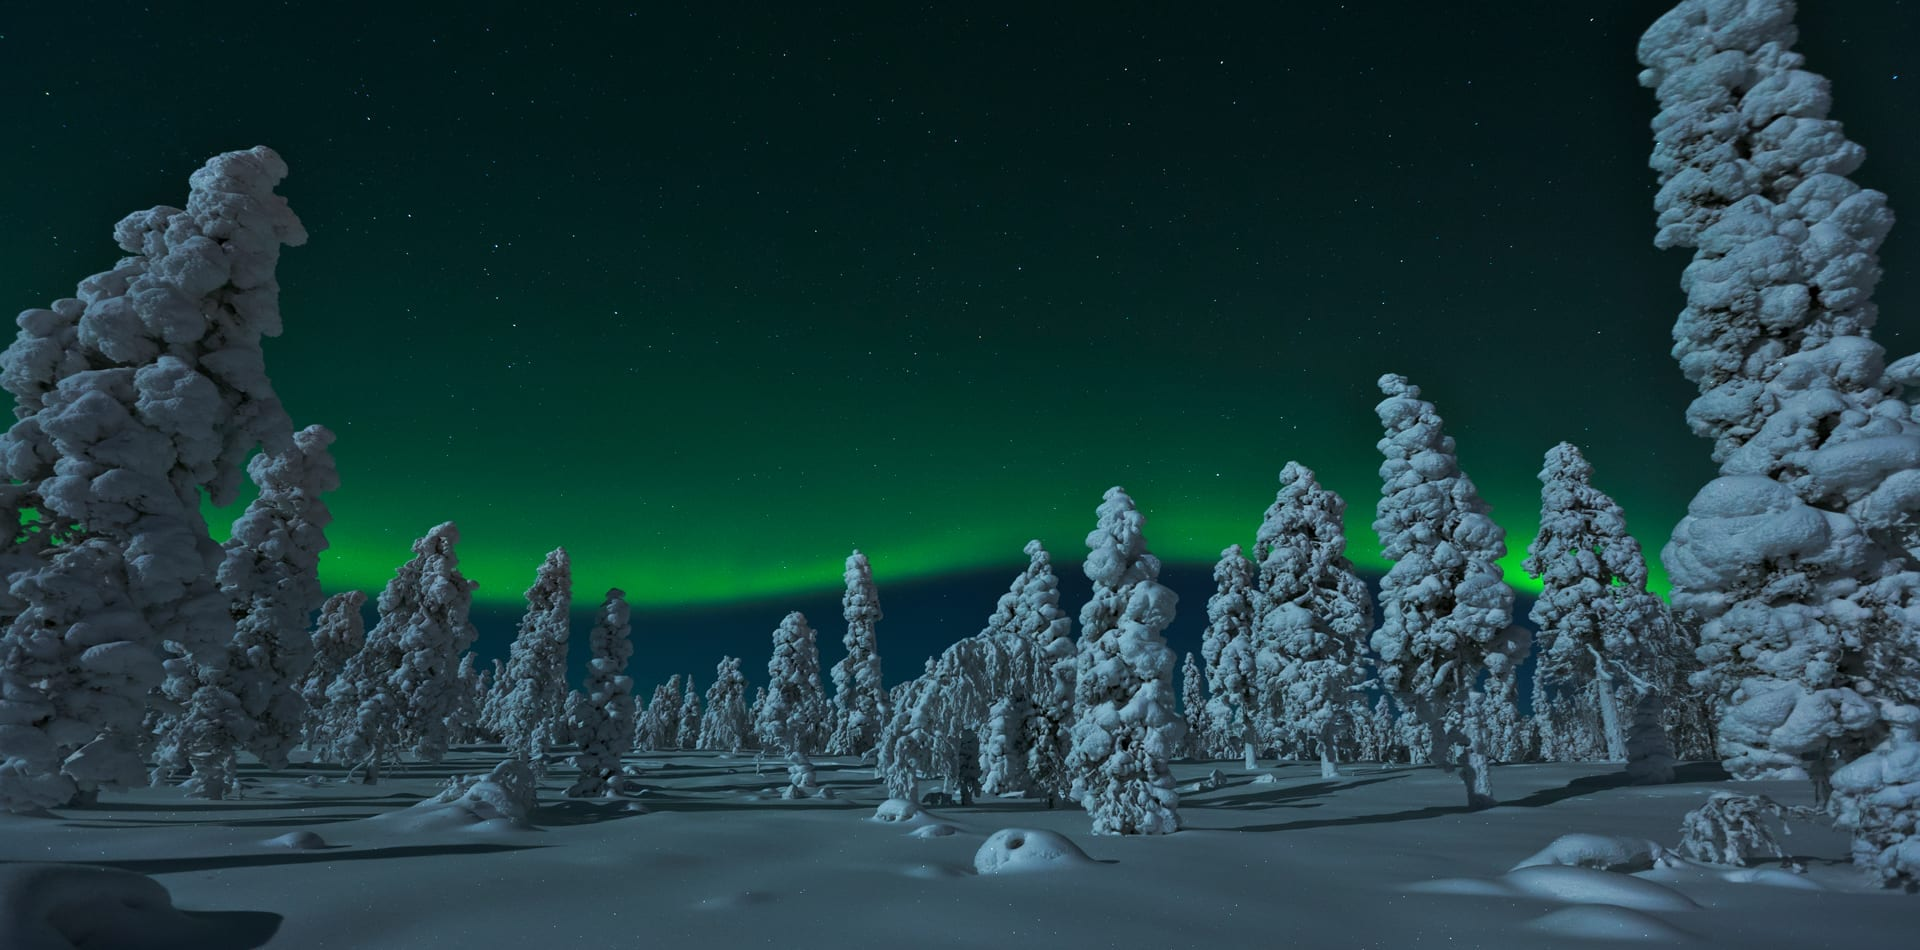 Northern Lights Aurora Borealis Lapland Finland